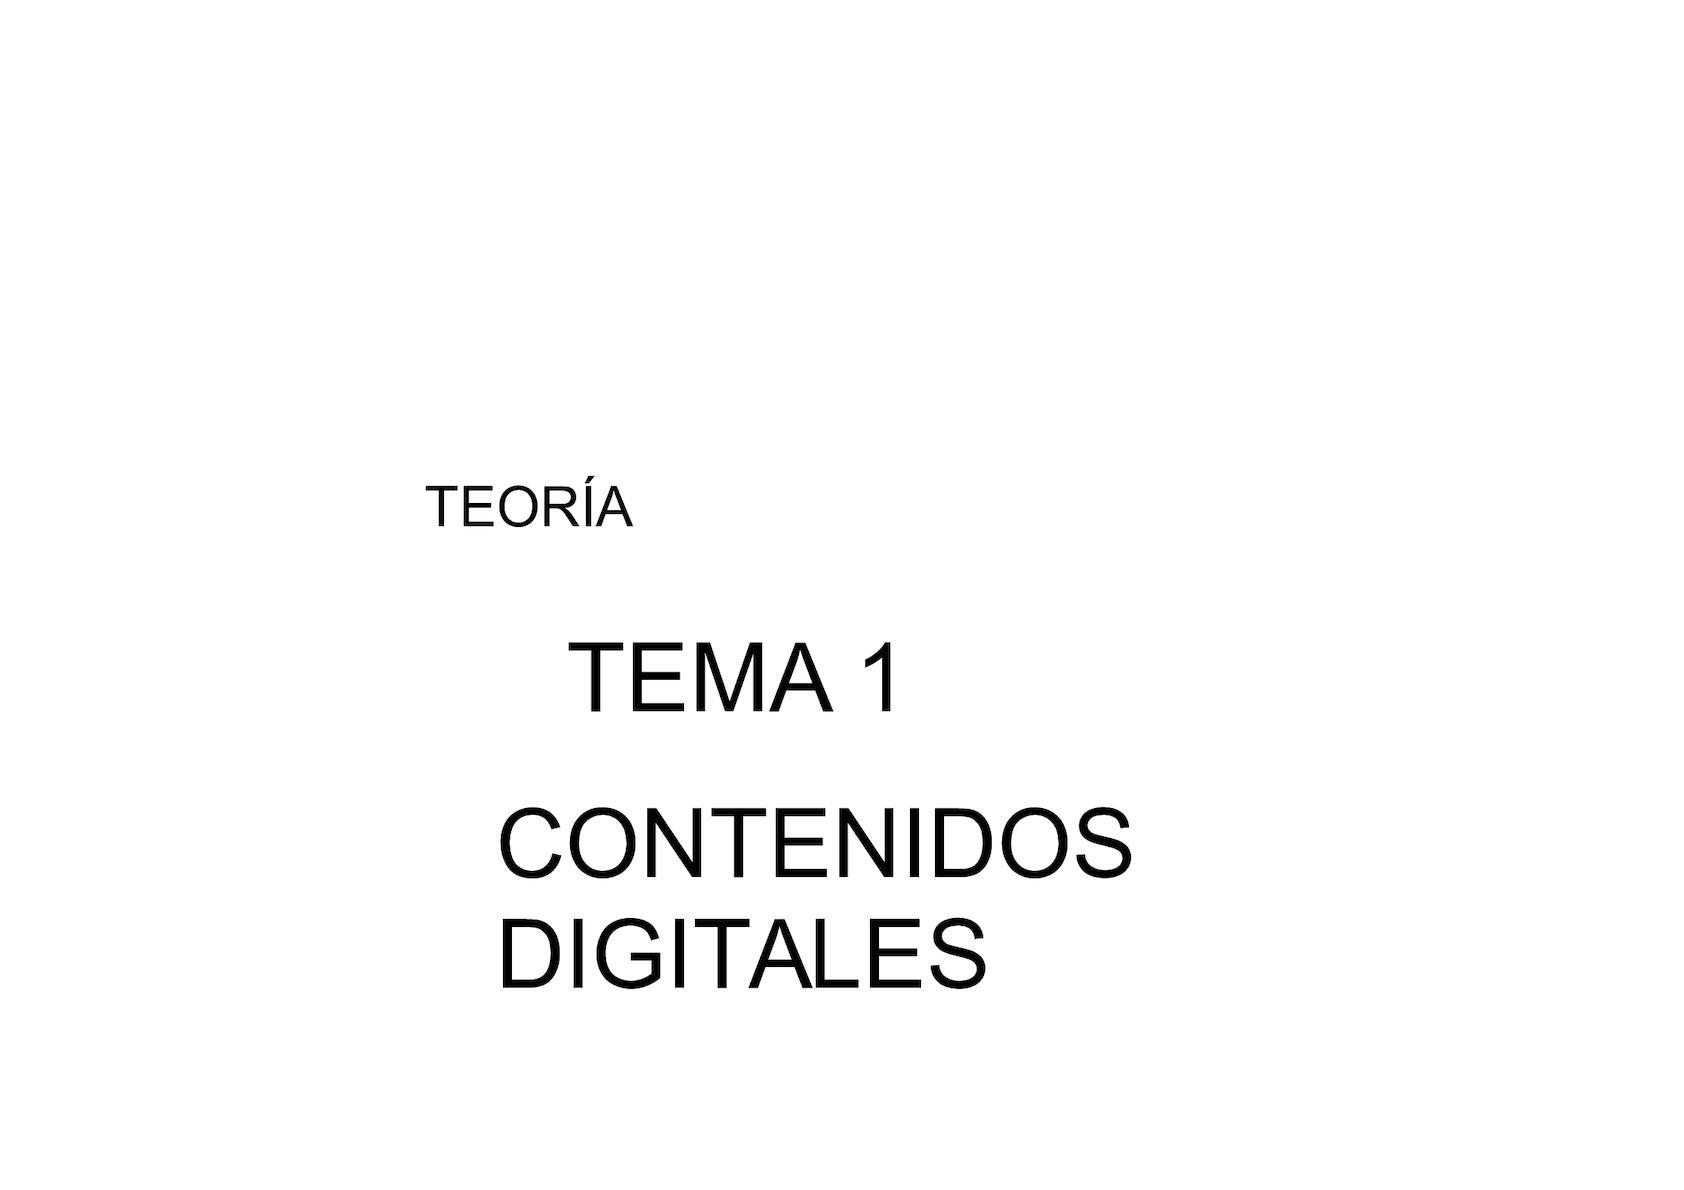 Calaméo - Tema 1 Contenidos Digitales